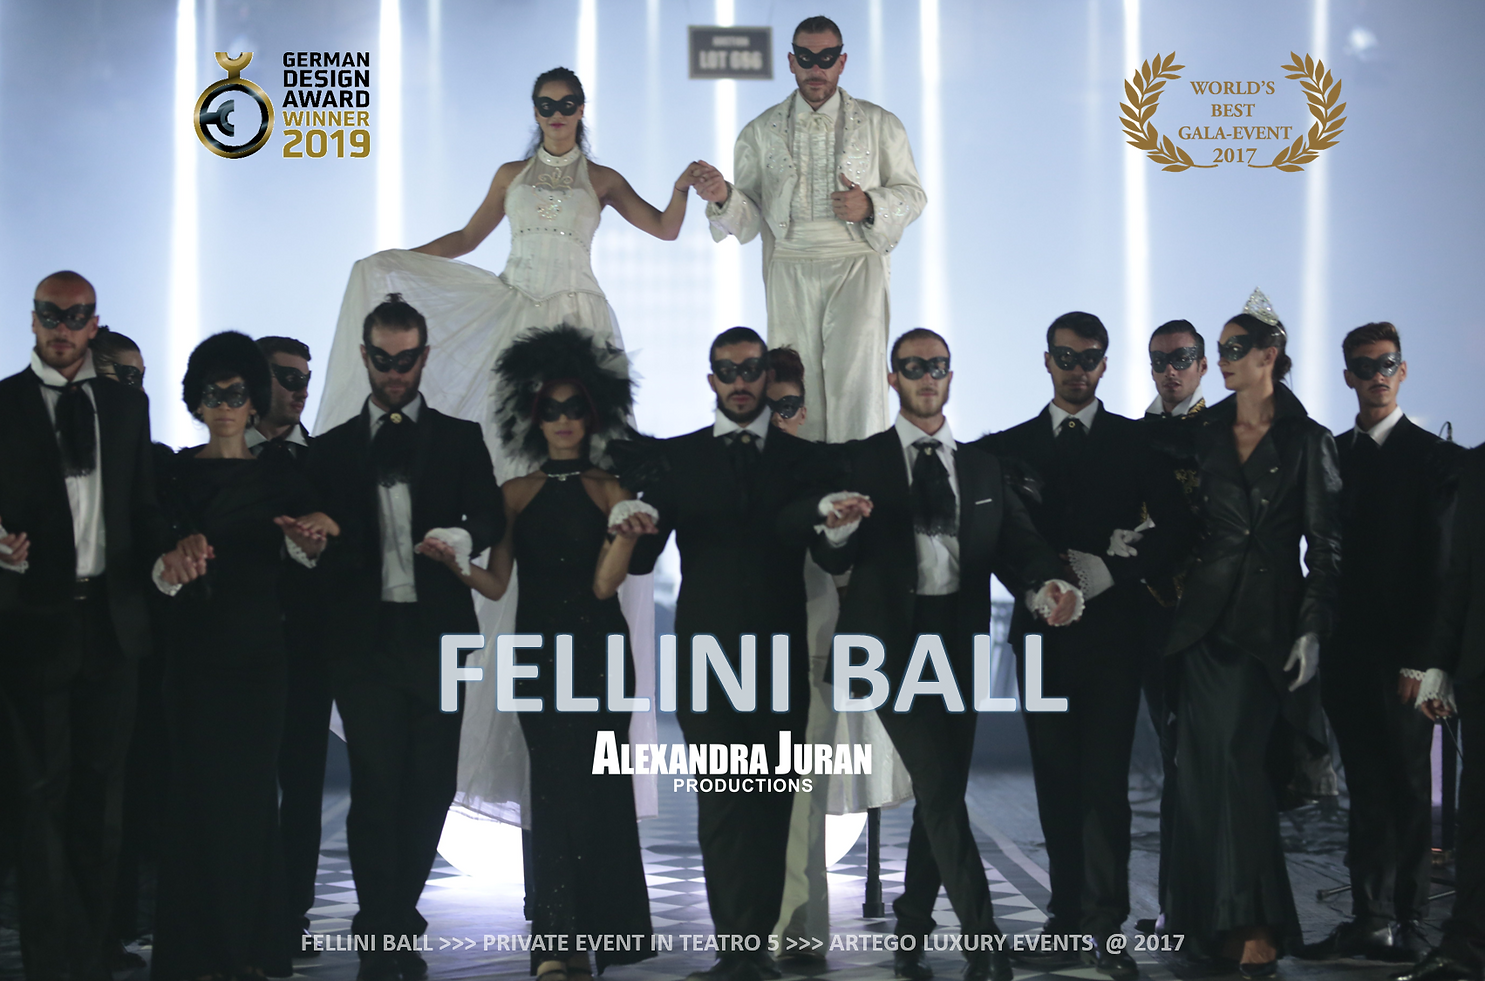 ALEXANDRA JURAN ARTEGO FELLINI LUXURY-EVENTS 1.png